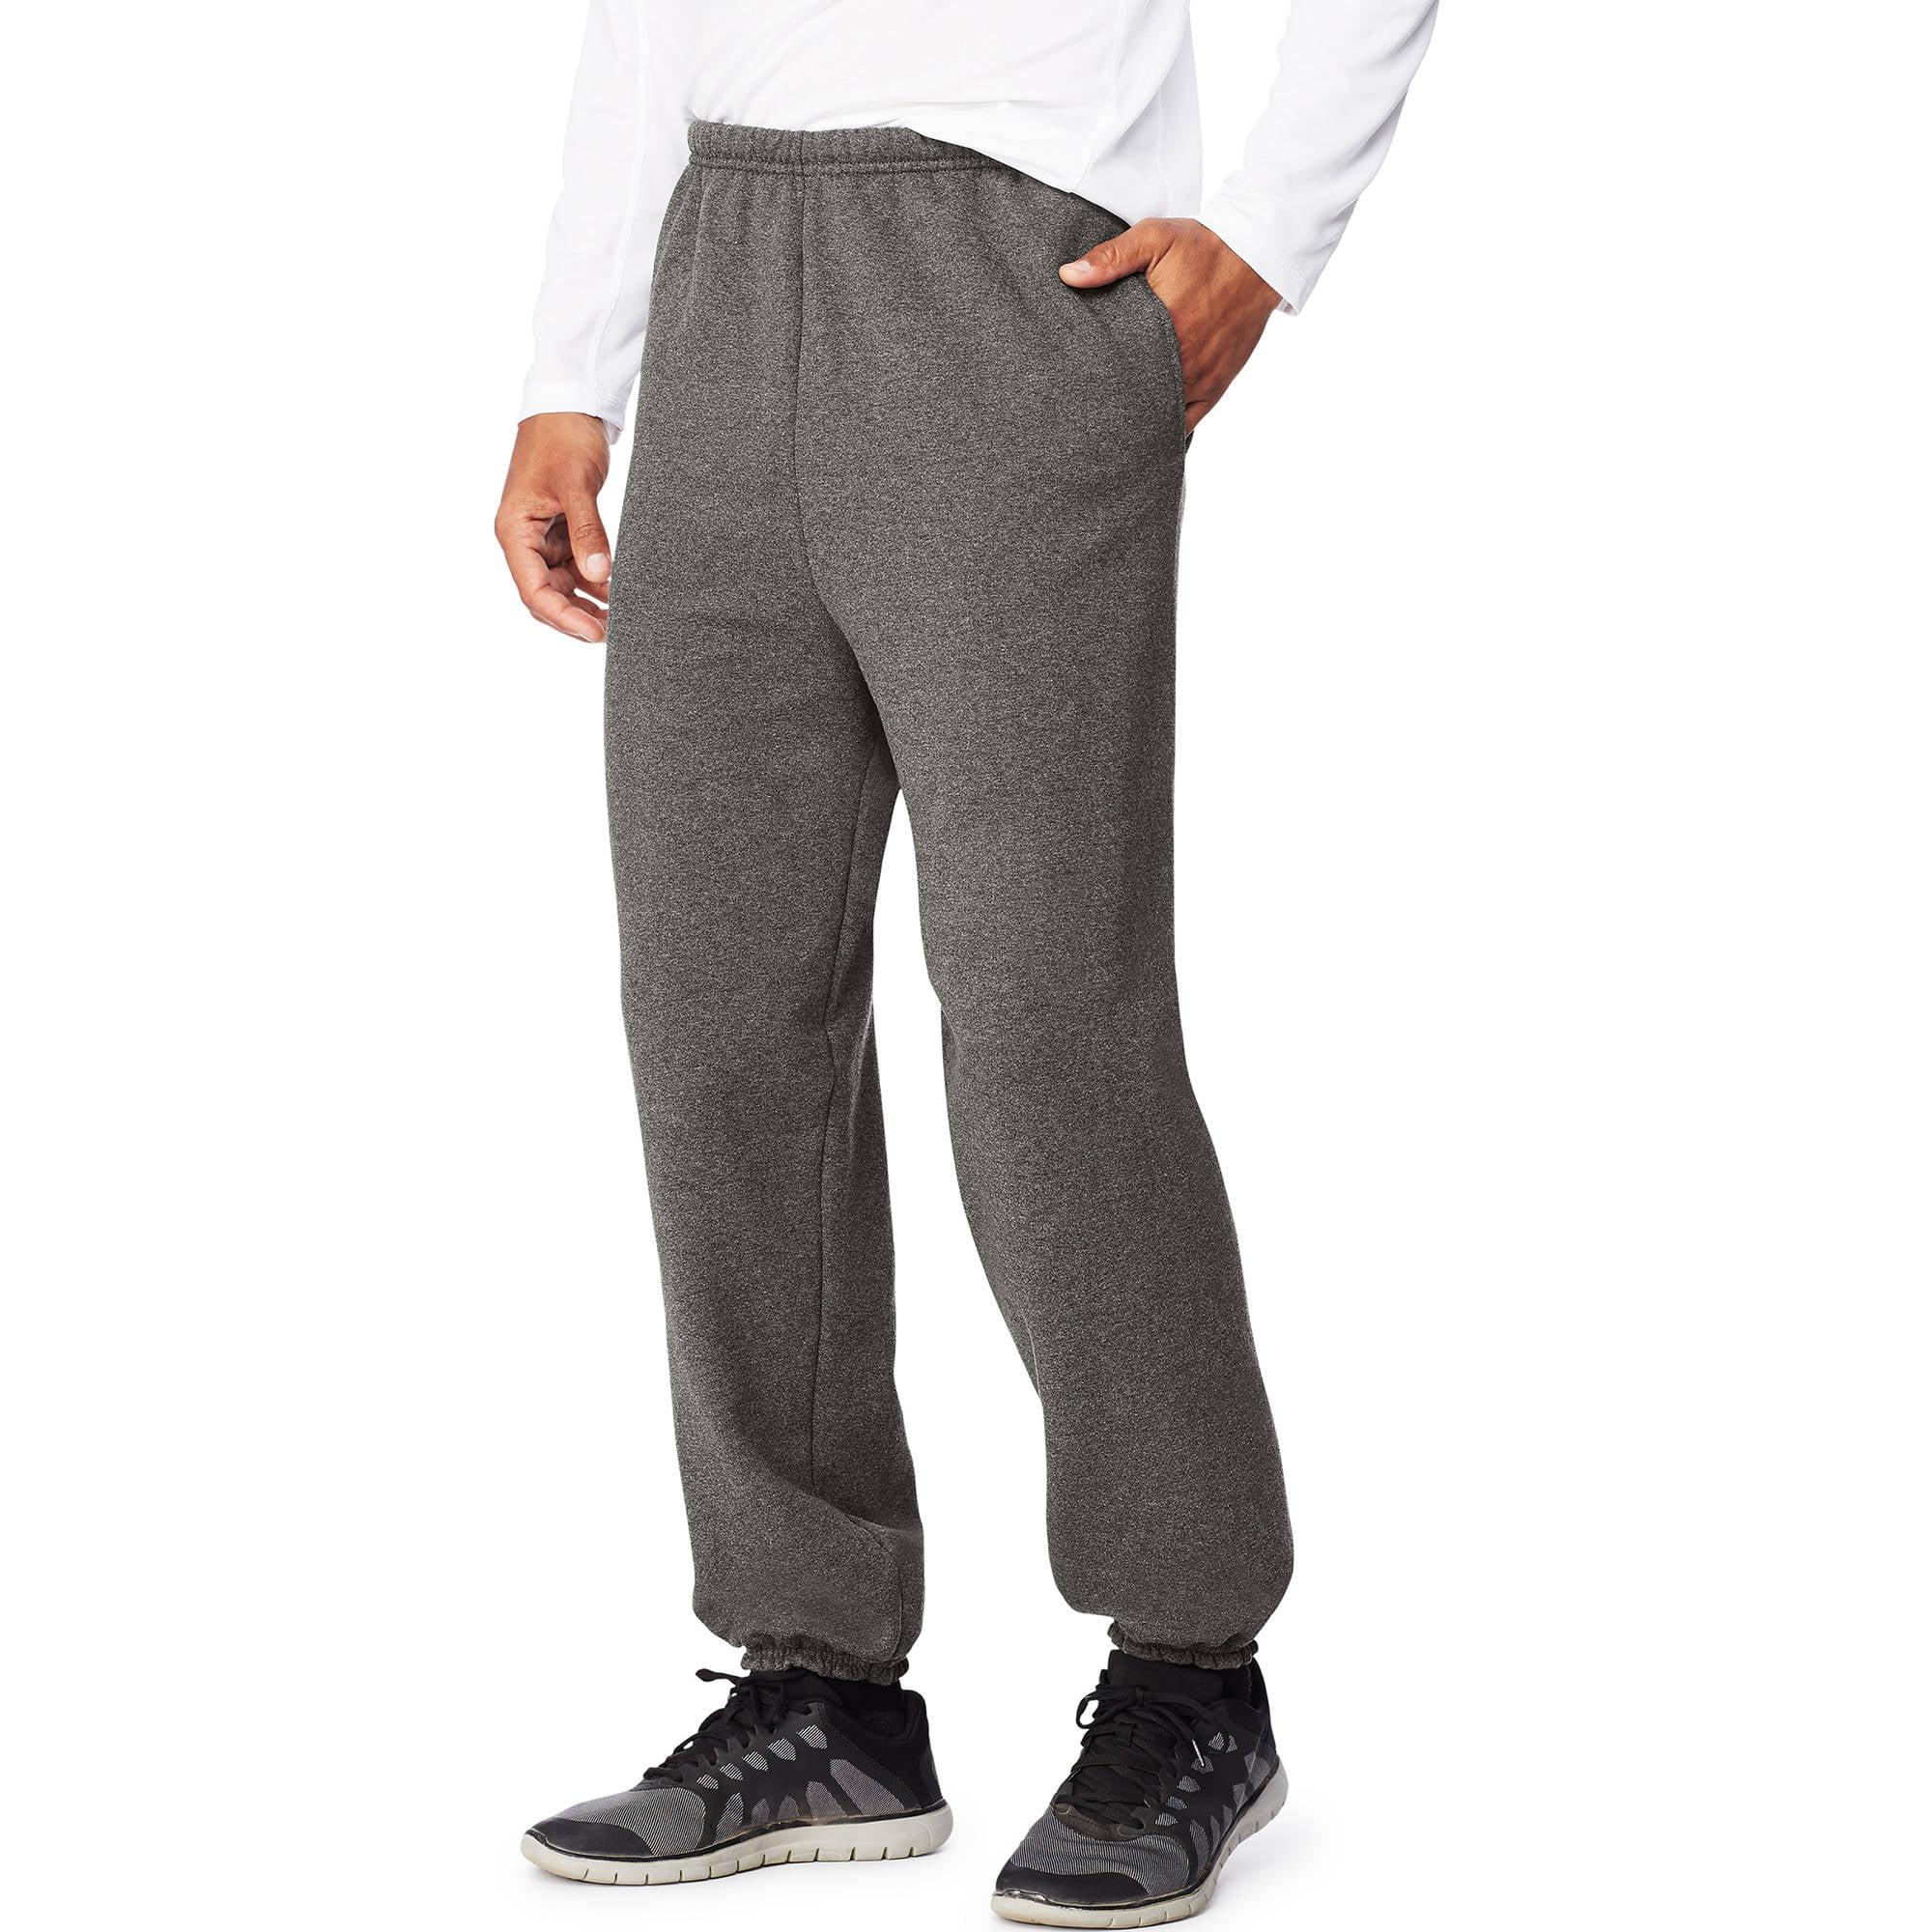 Hanes Sport Ultimate Cotton Big Men's Fleece Sweatpants with Pockets